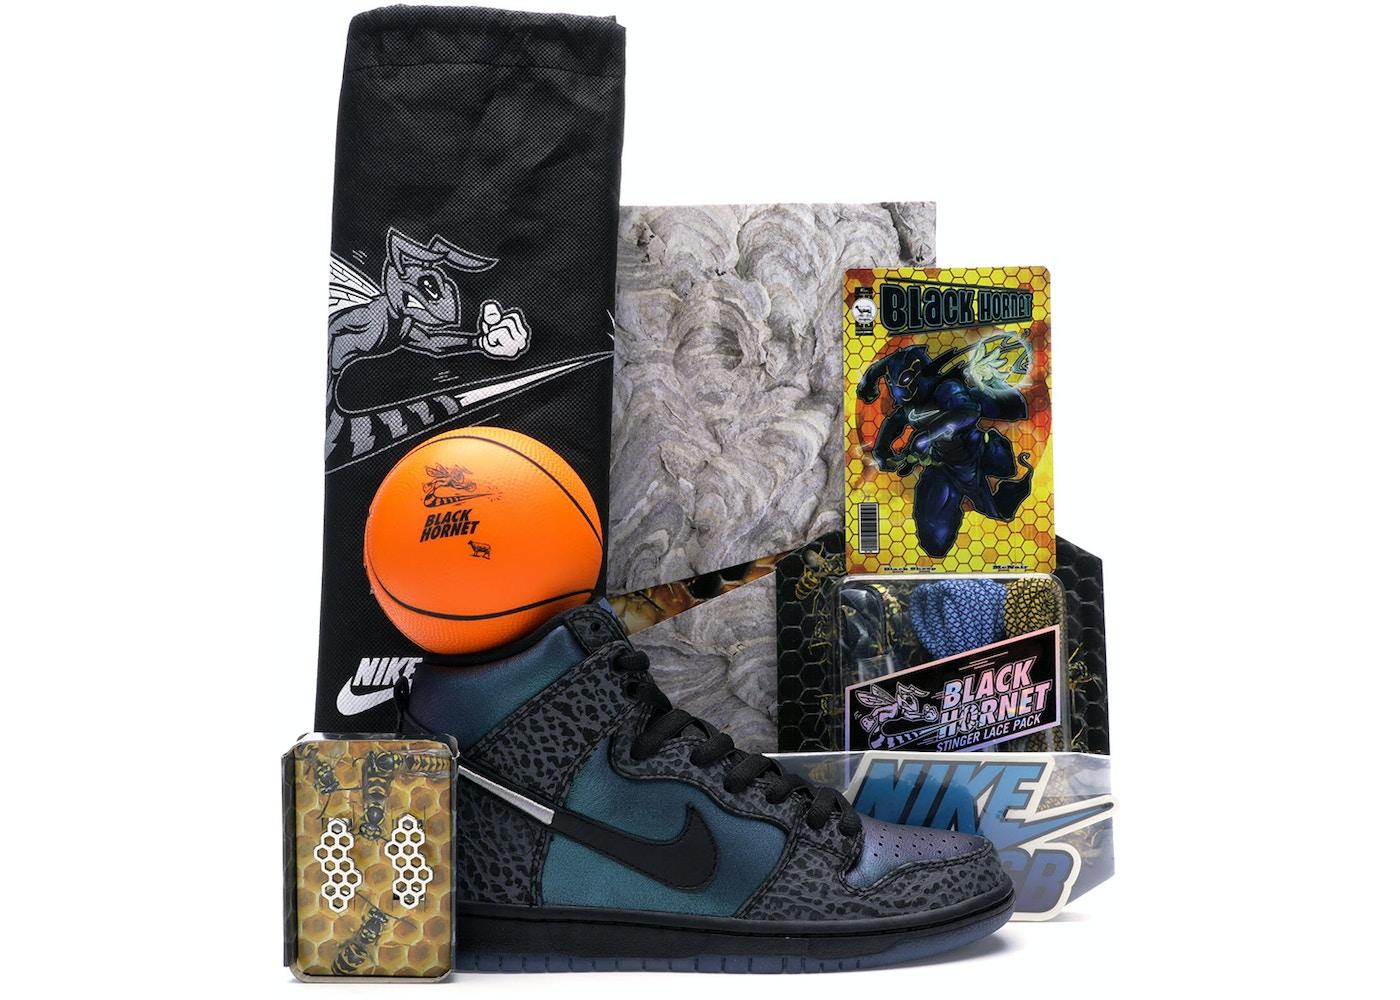 timeless design 95201 9dfe3 Buy Nike SB SB Dunk High Shoes  Deadstock Sneakers